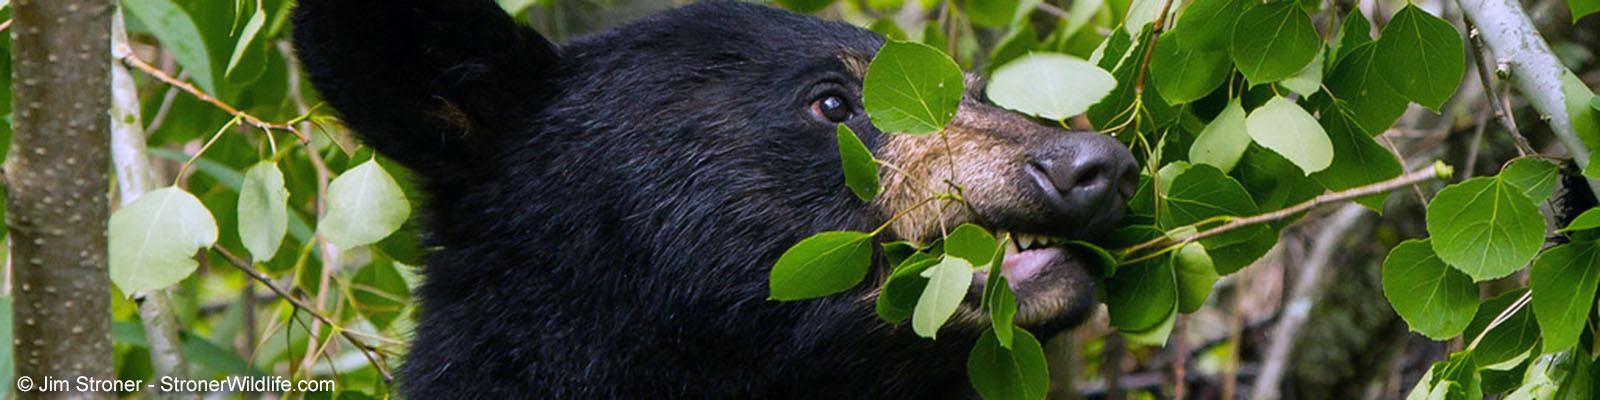 Animal Protein - North American Bear CenterNorth American